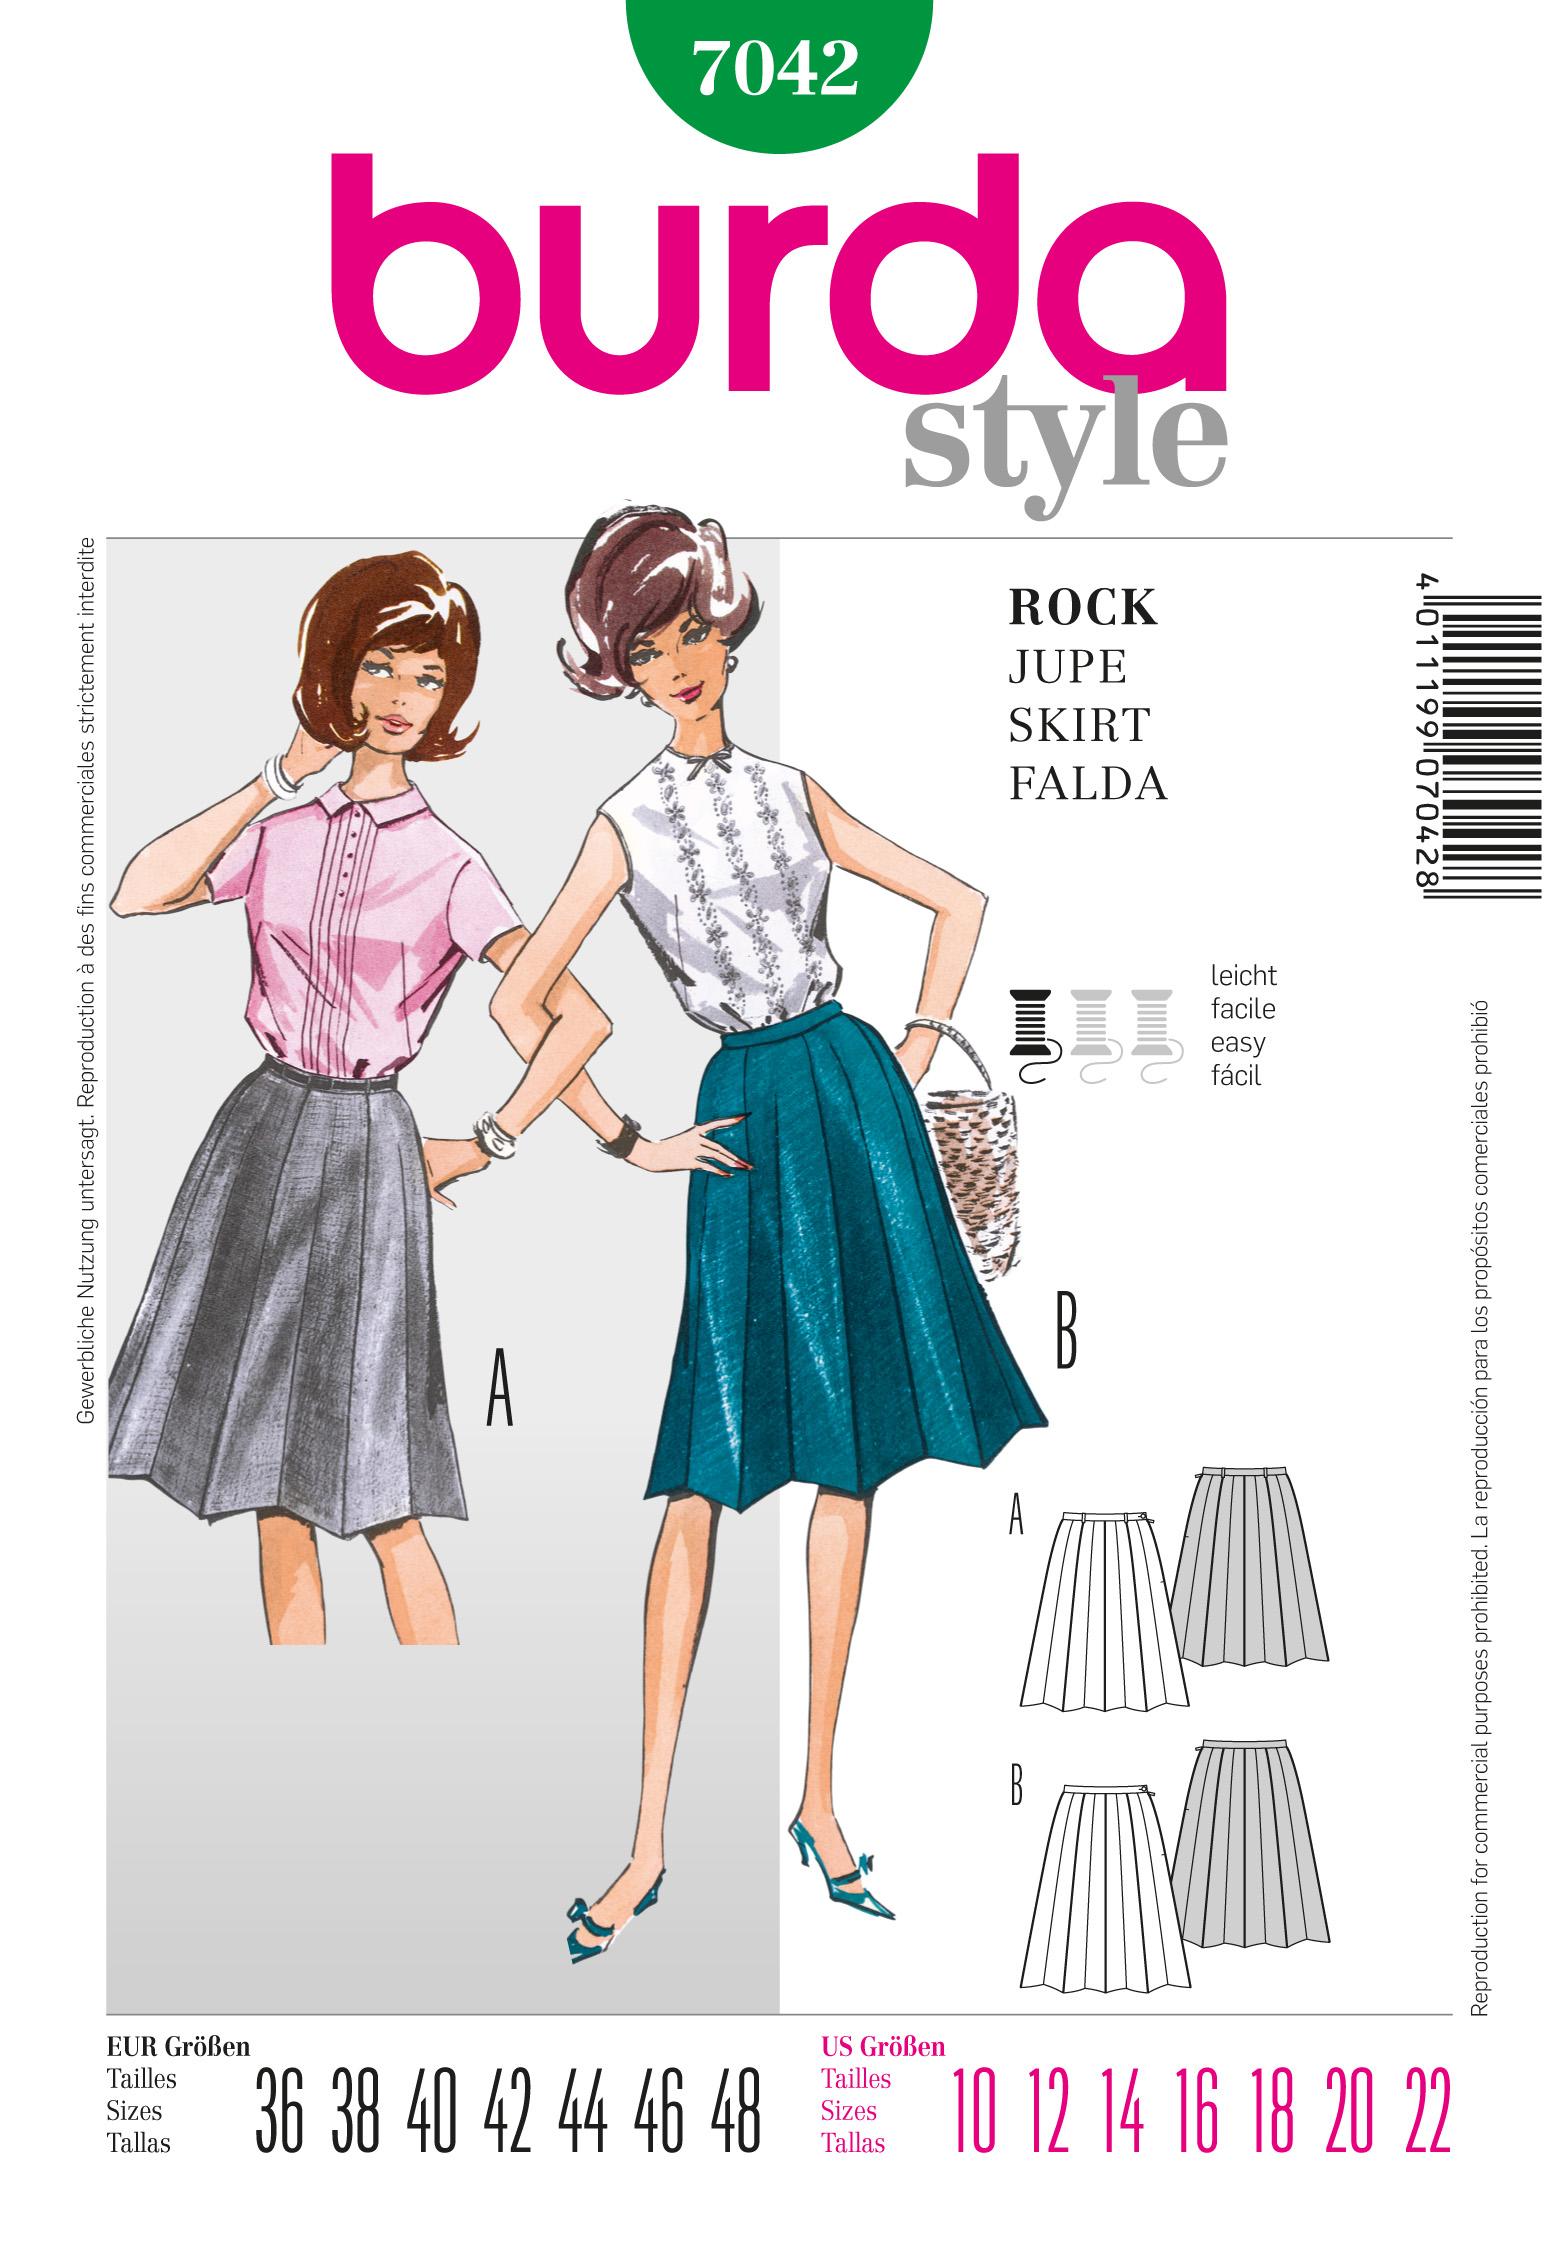 Burda Vintage Skirt 7042